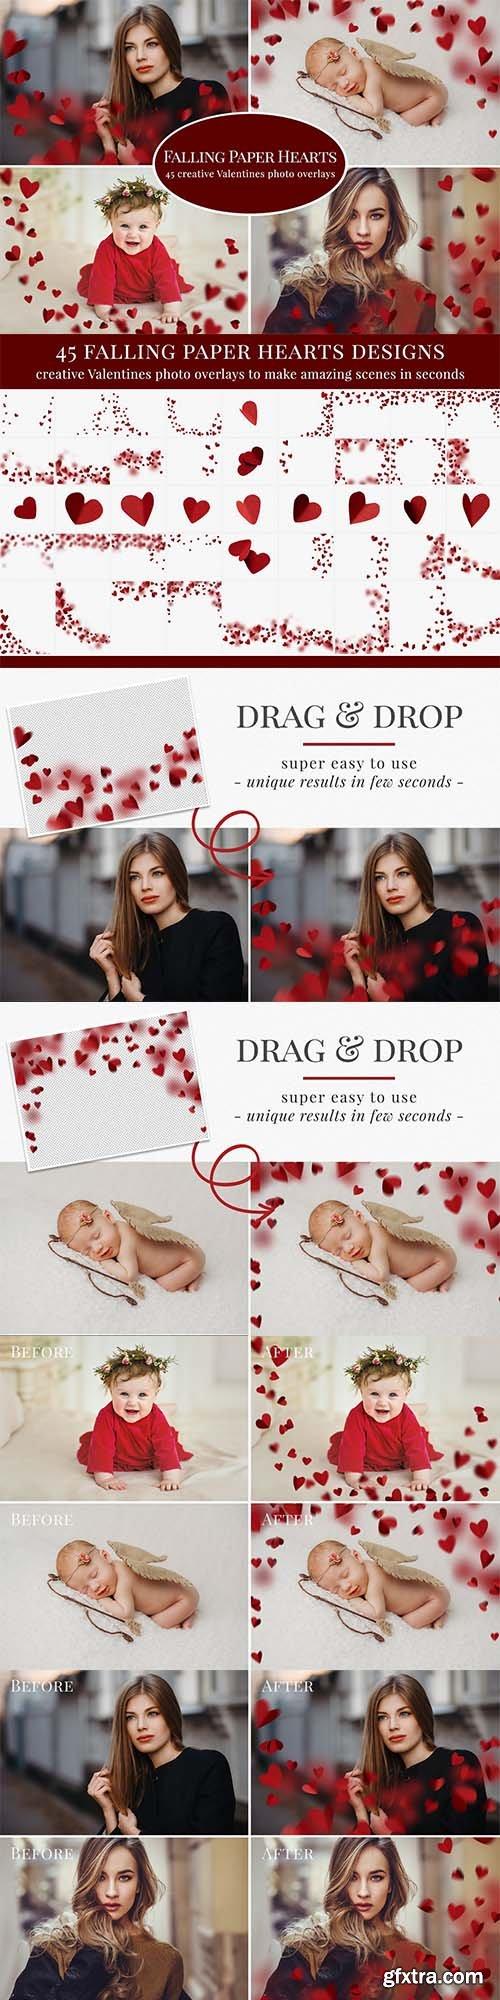 CreativeMarket - Falling Paper Hearts photo overlays 5791182